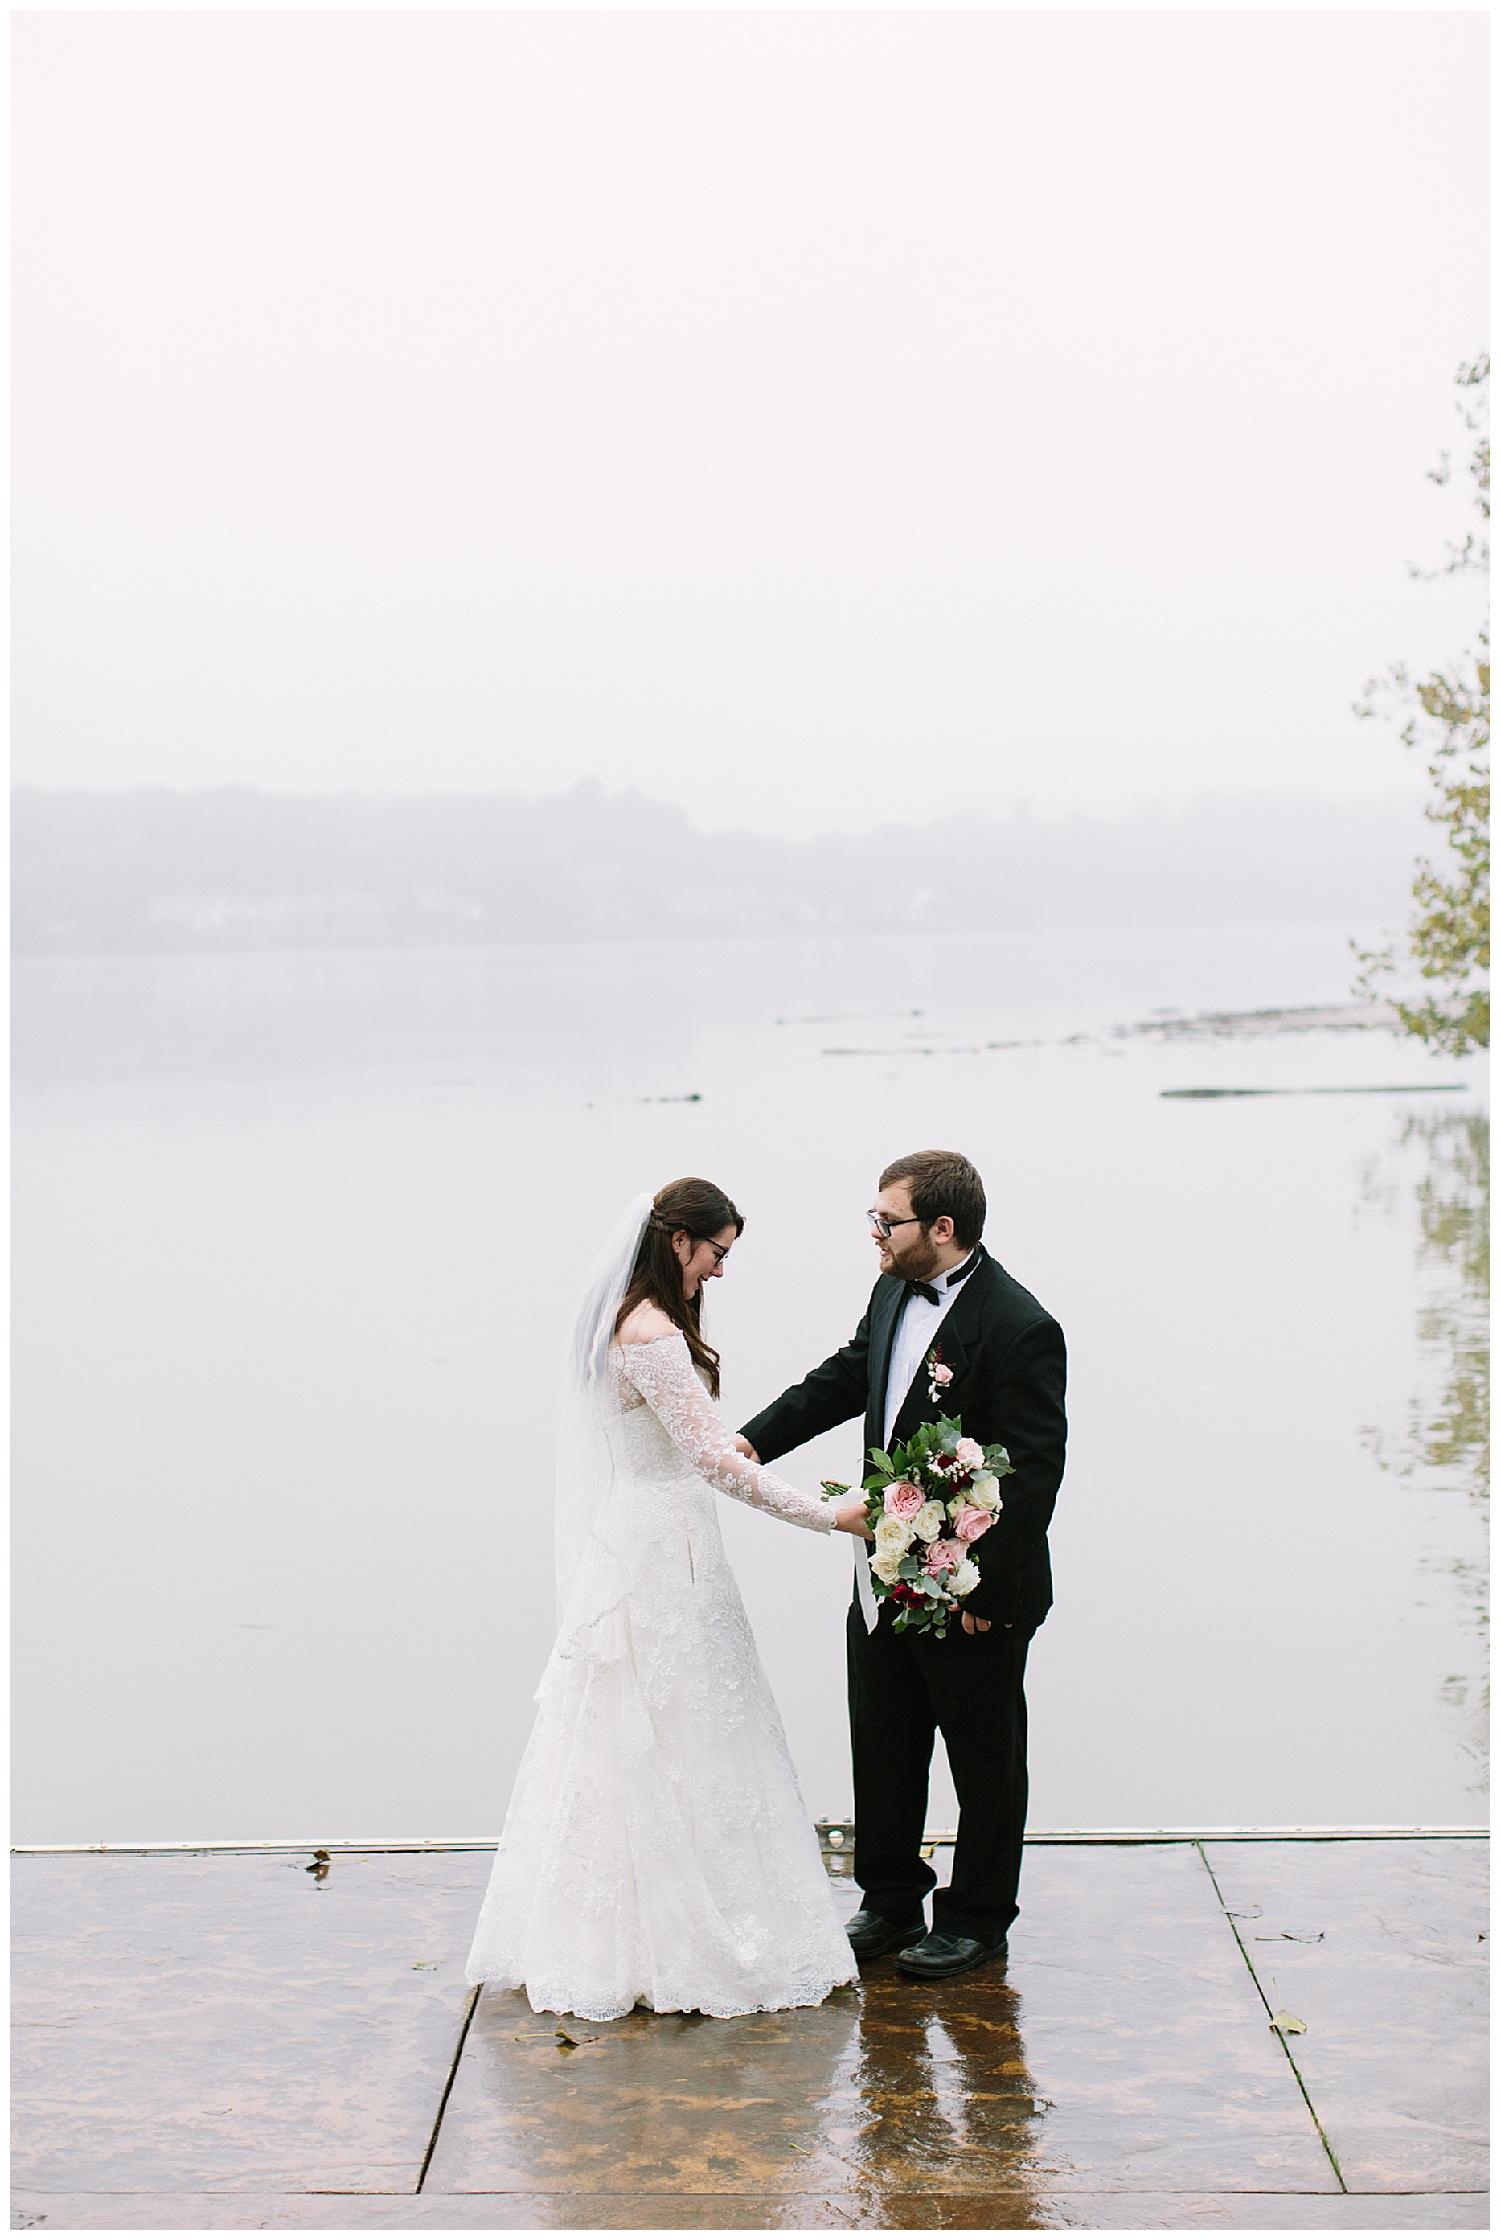 trent.and.kendra.photography.captains.quarters.princess.cruise.wedding-51.jpg